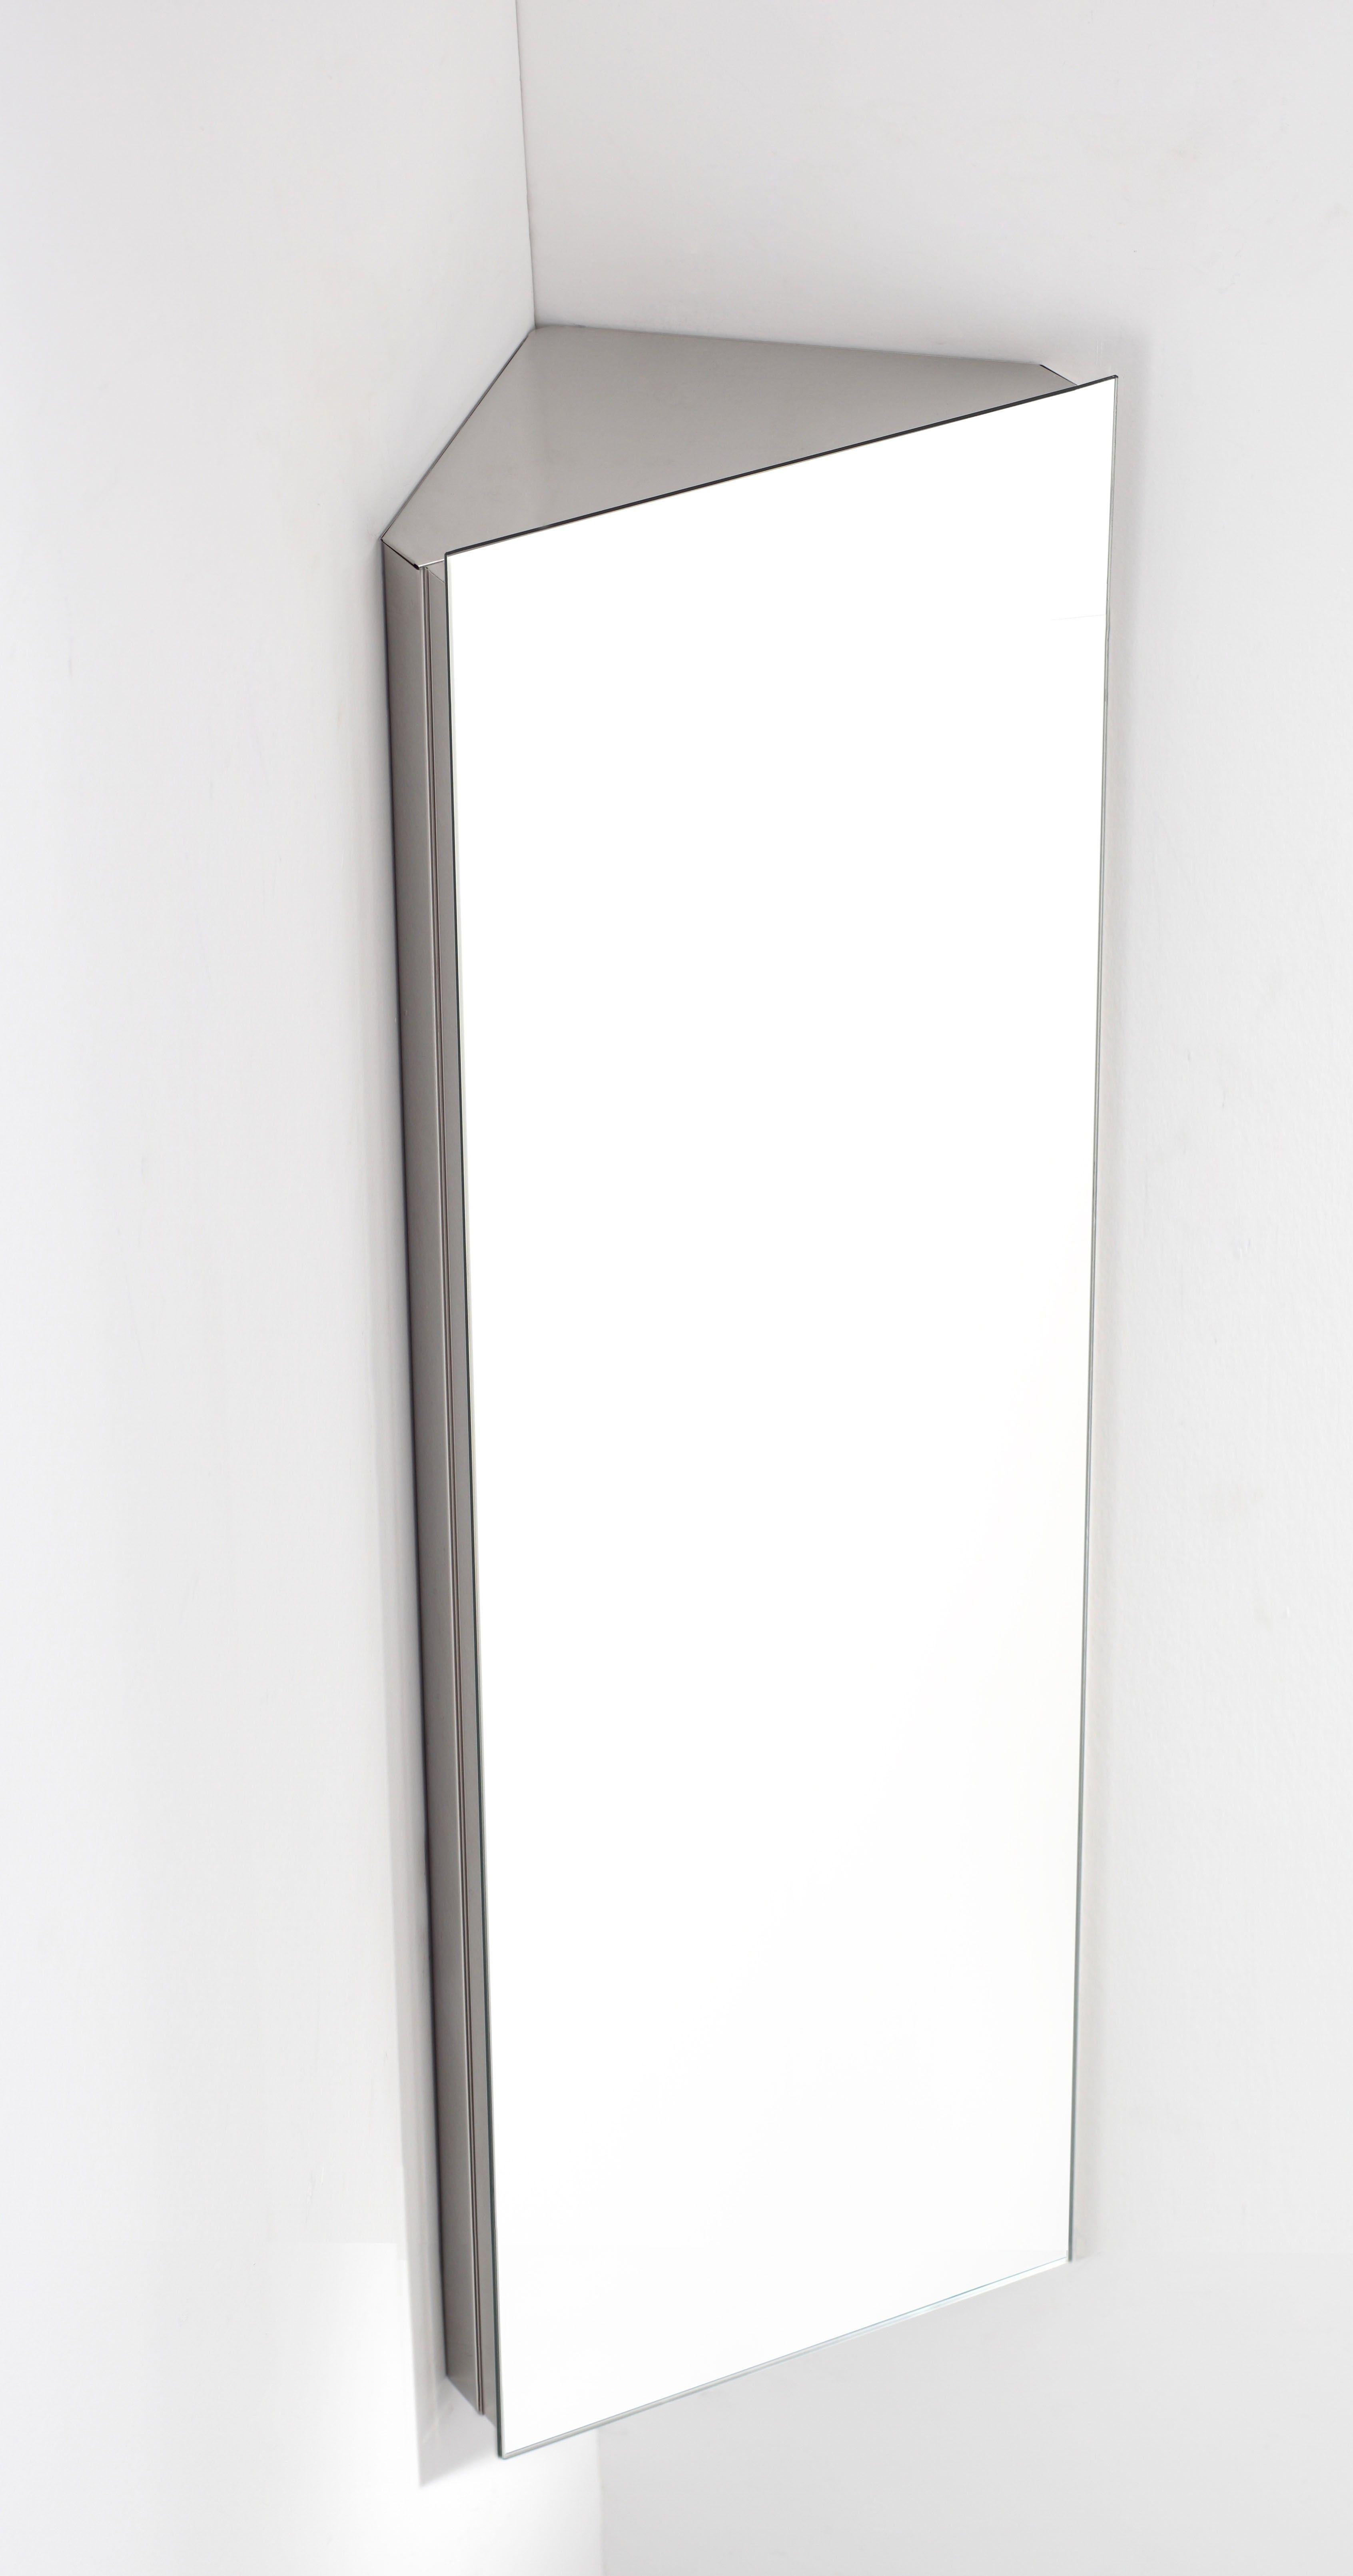 Tall Mirrored Bathroom Cabinet 2021 In 2020 Bathroom Wall Cabinets Corner Bathroom Mirror Bathroom Corner Cabinet